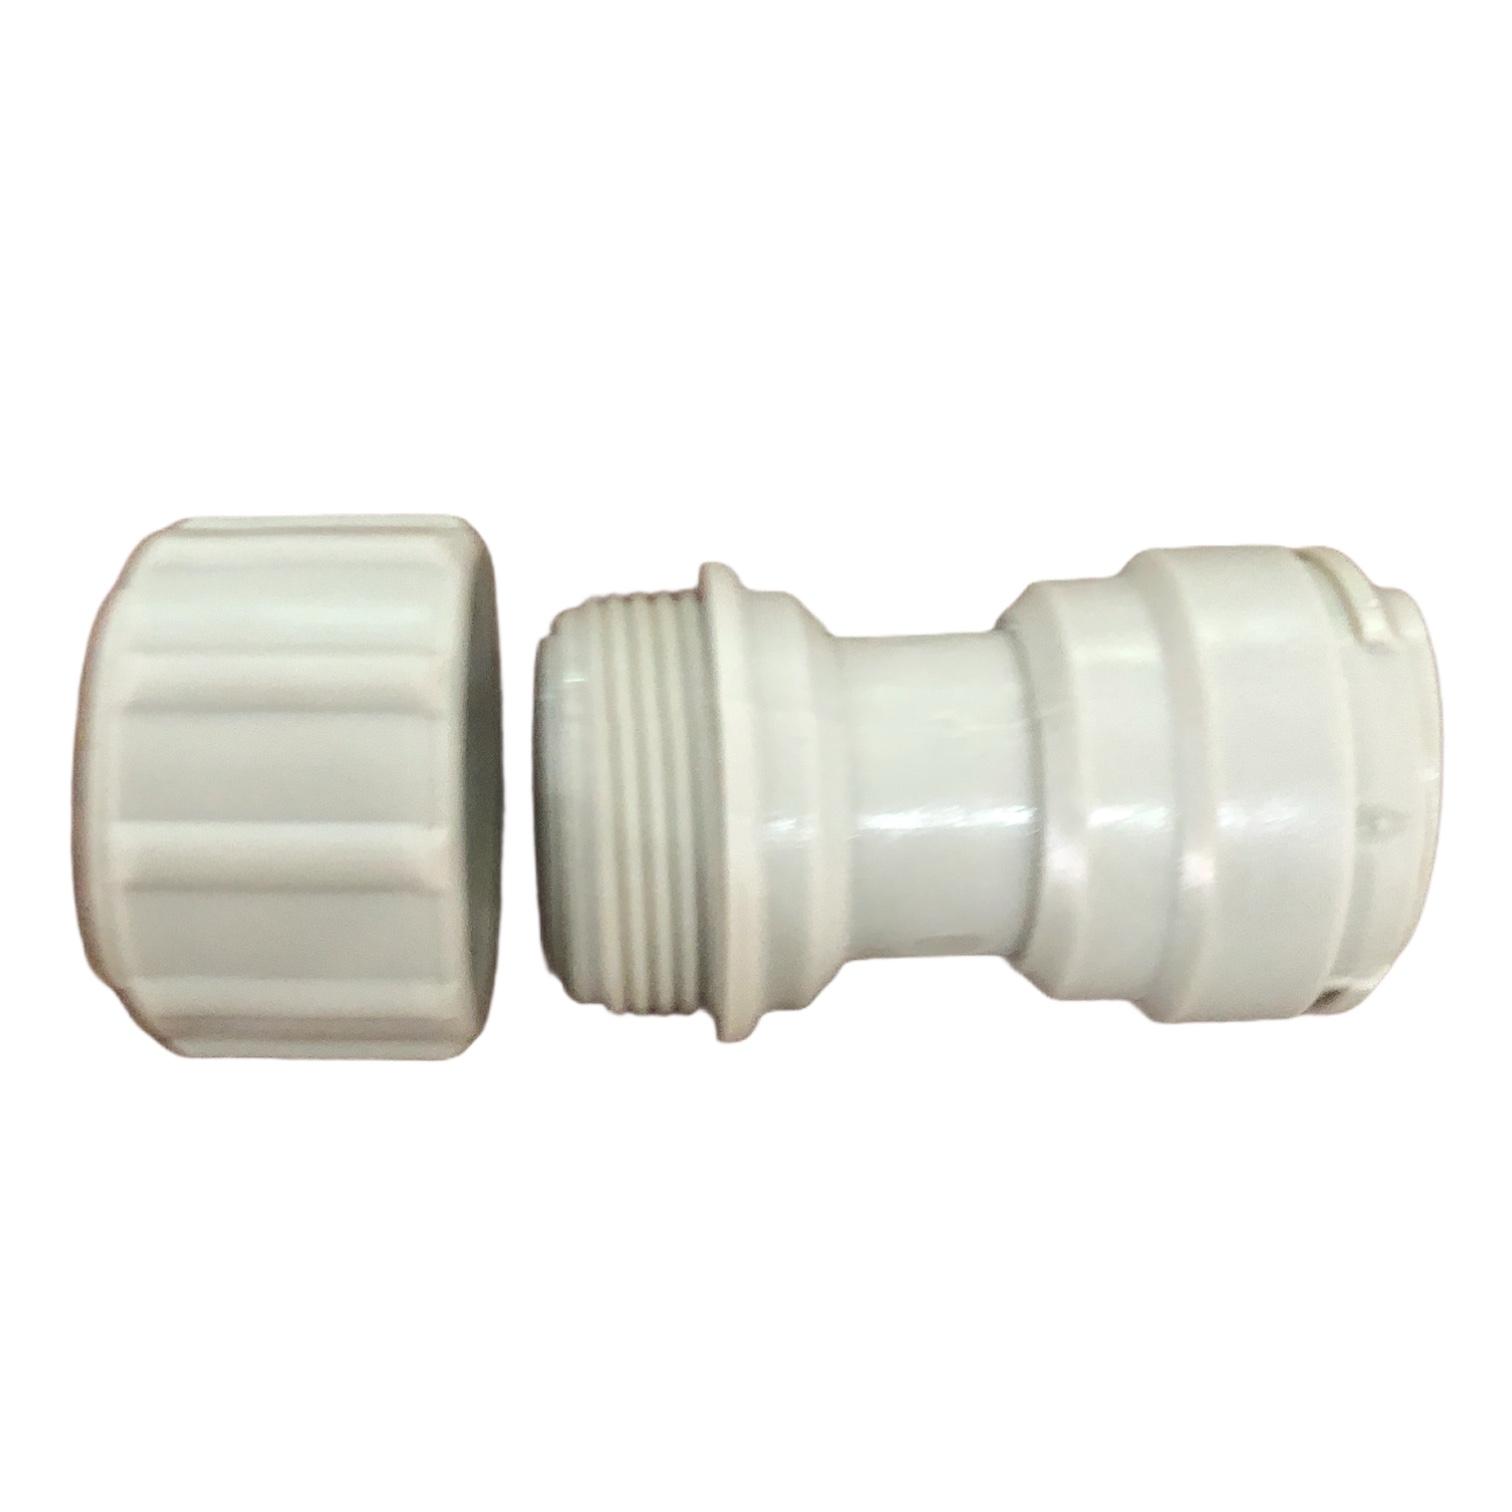 DMFIT - Conexao Engate Rapido tubo X Inox 3/8 x 3/8 Chopp